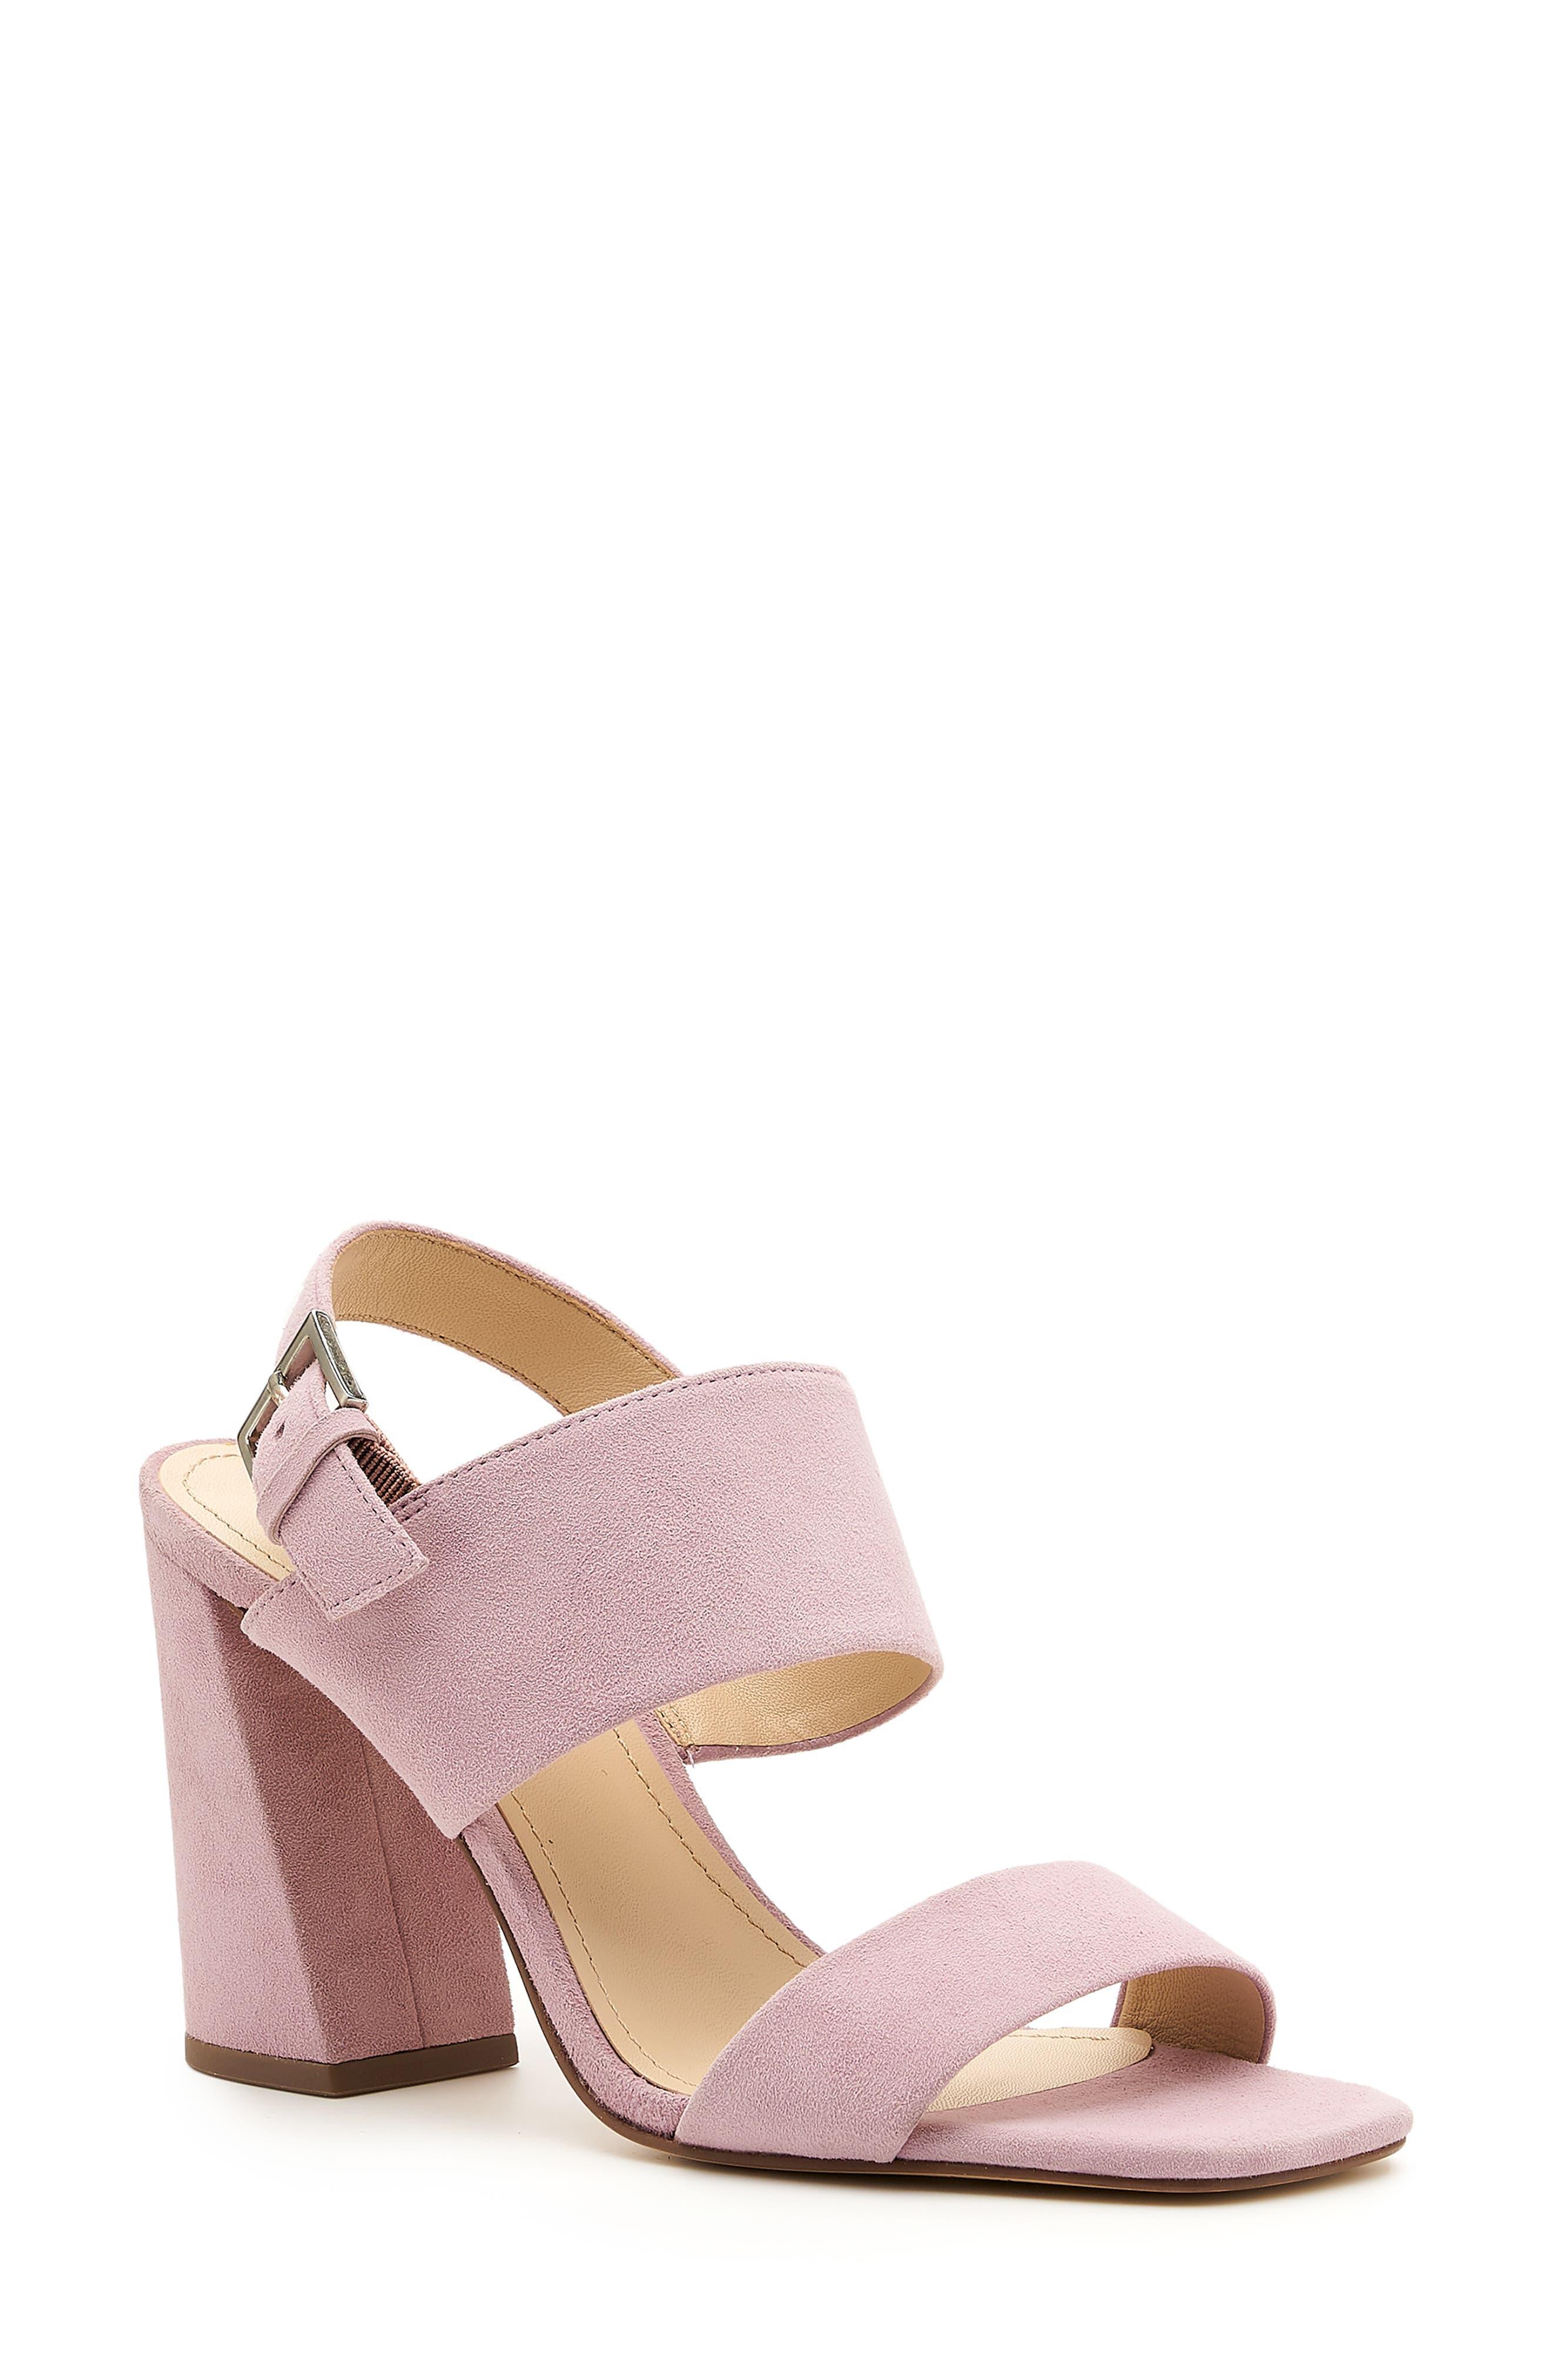 Farrah Slingback Sandal